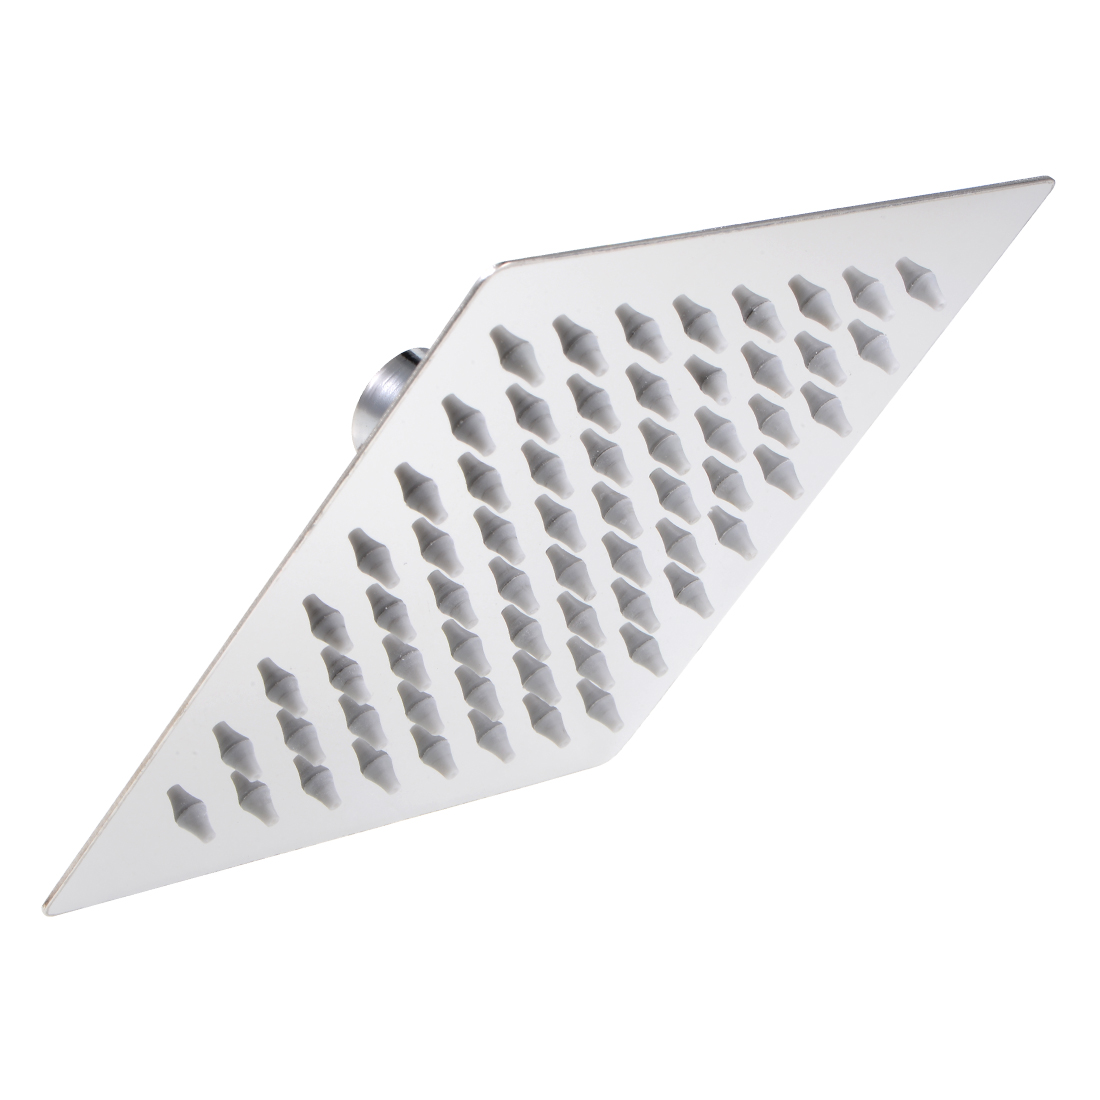 High Pressure Shower Head 6 Inch Rain Shower Head 360 Adjustable Stainless Steel